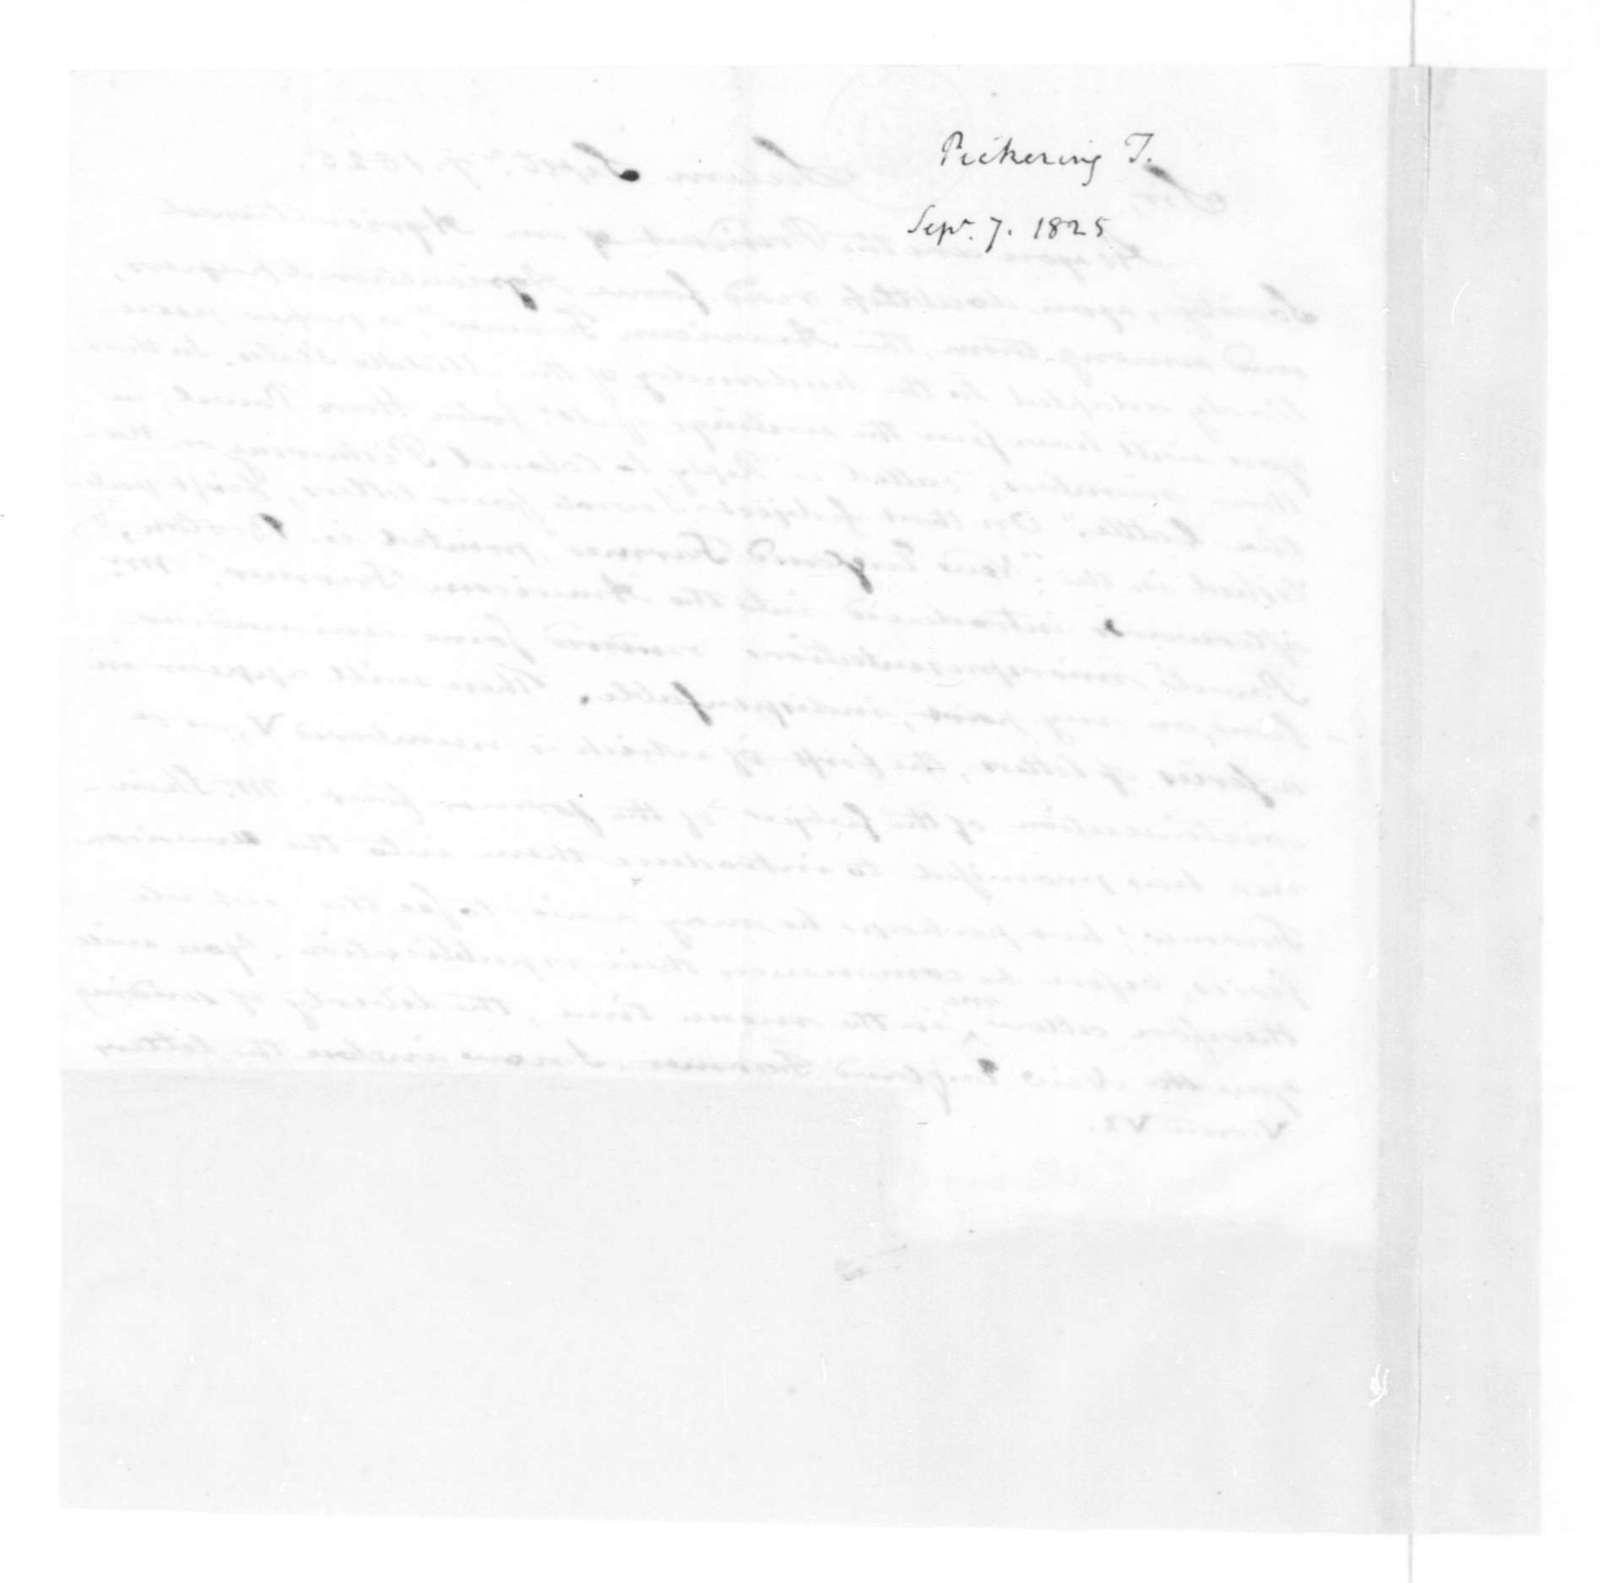 Timothy Pickering to James Madison, September 7, 1825.